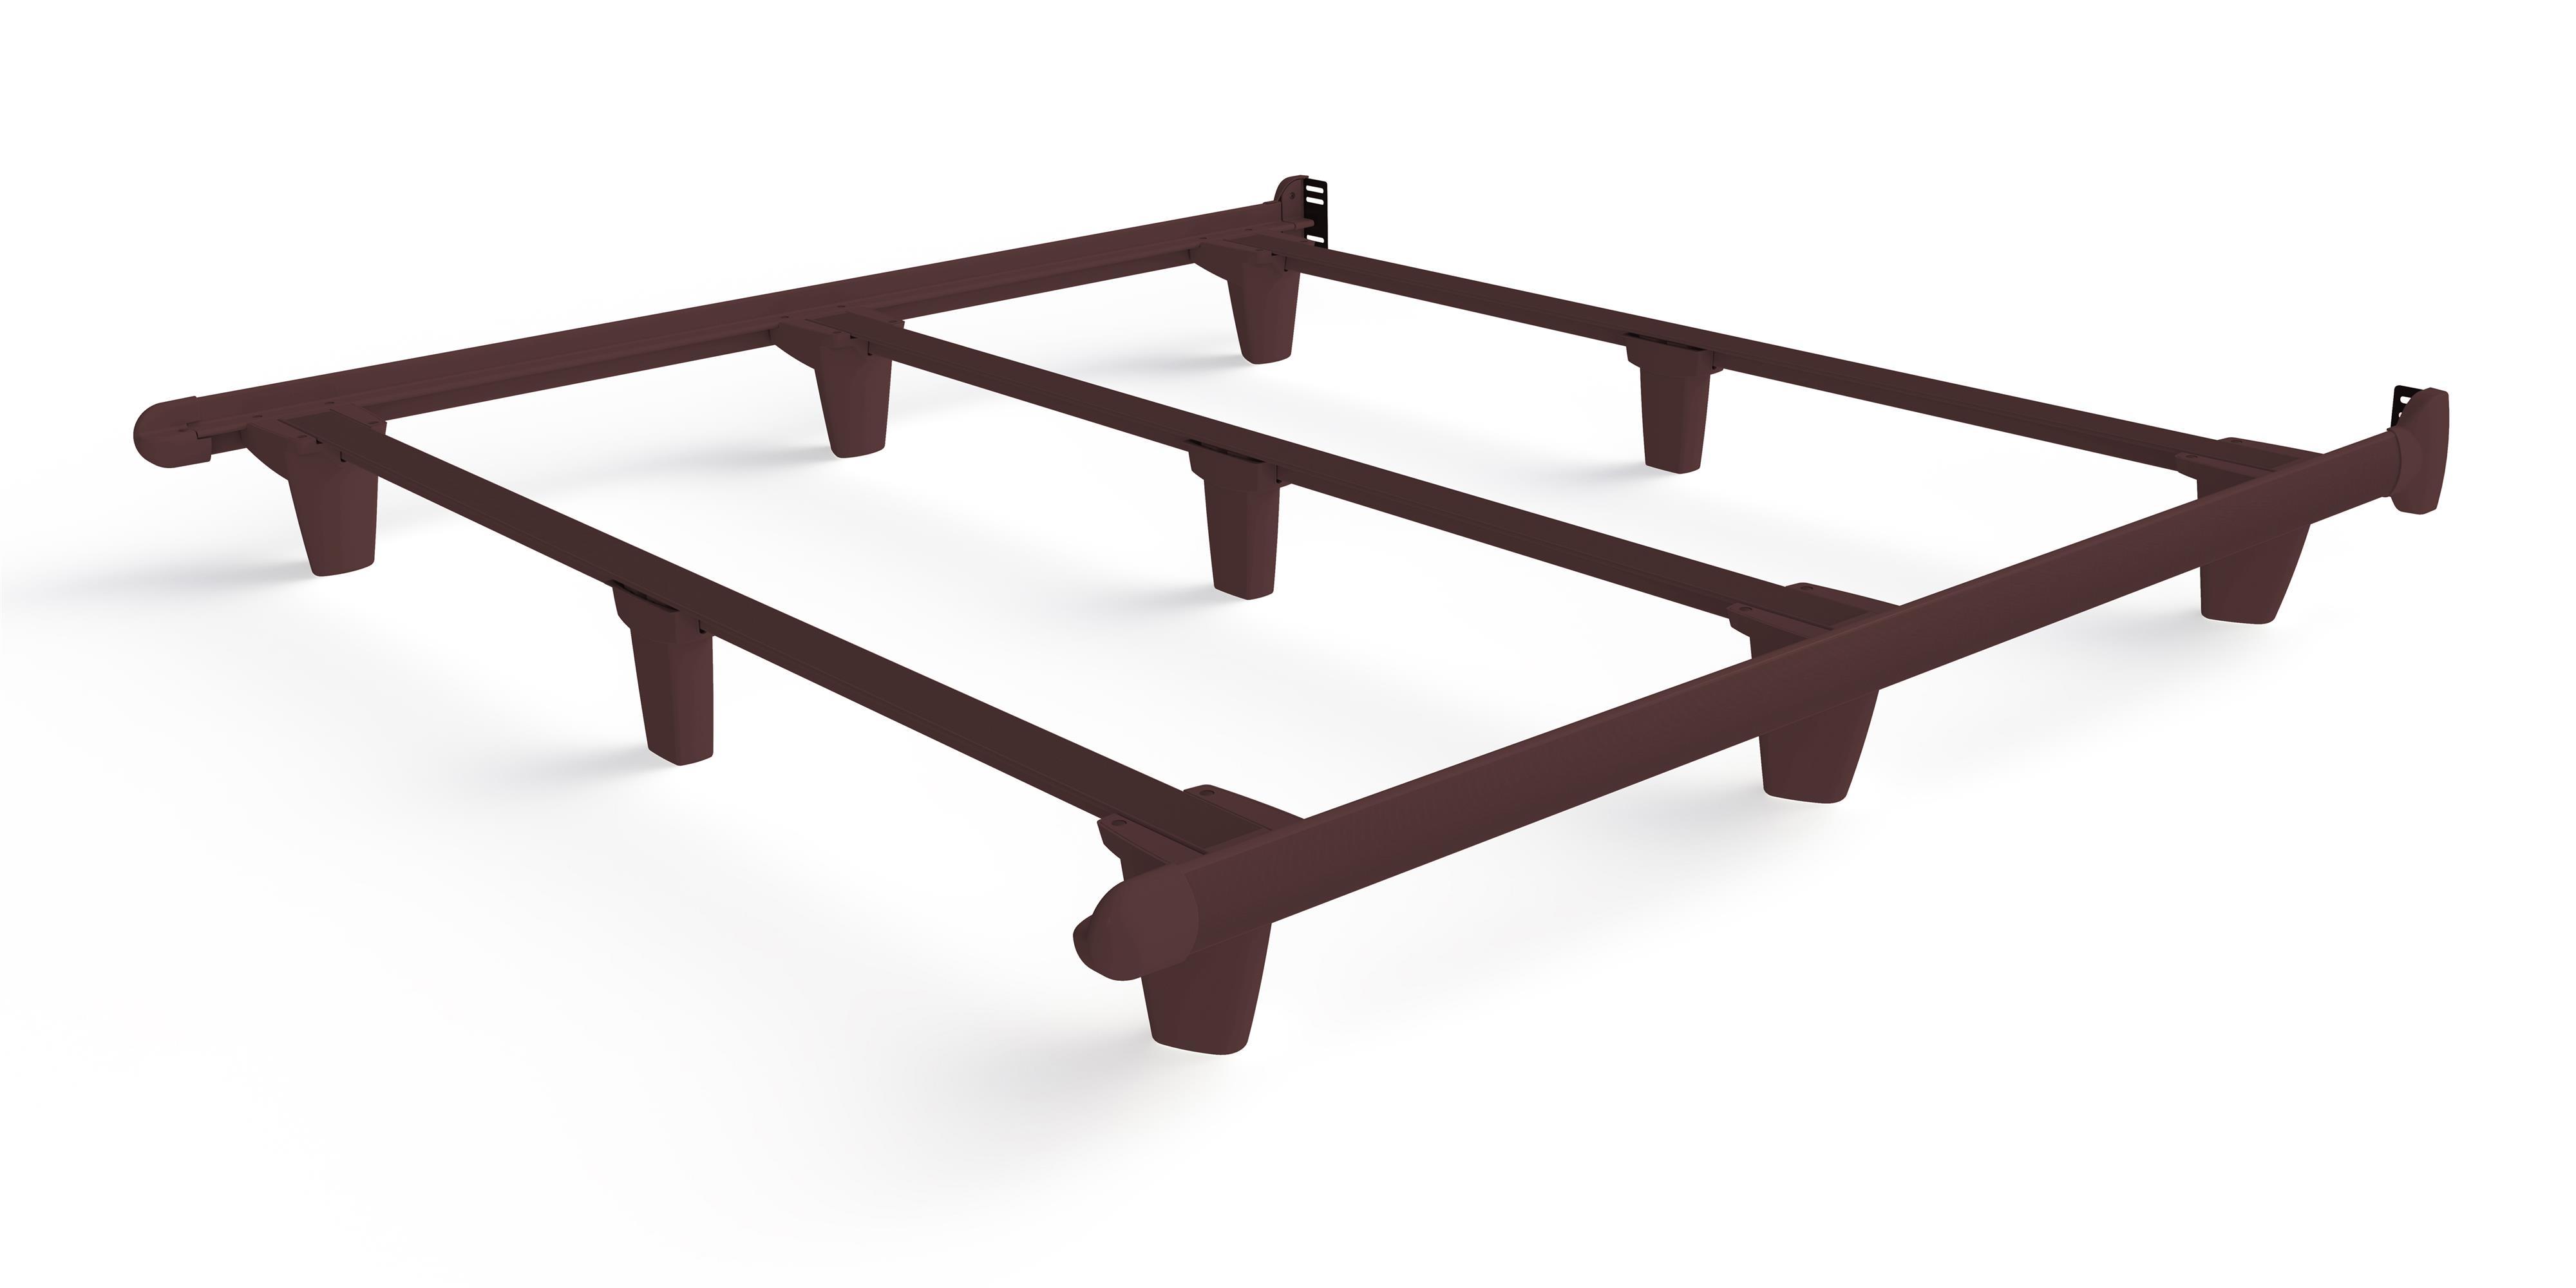 Embrace emBrace Eastern King Bed Frame - Brown by Knickerbocker at HomeWorld Furniture